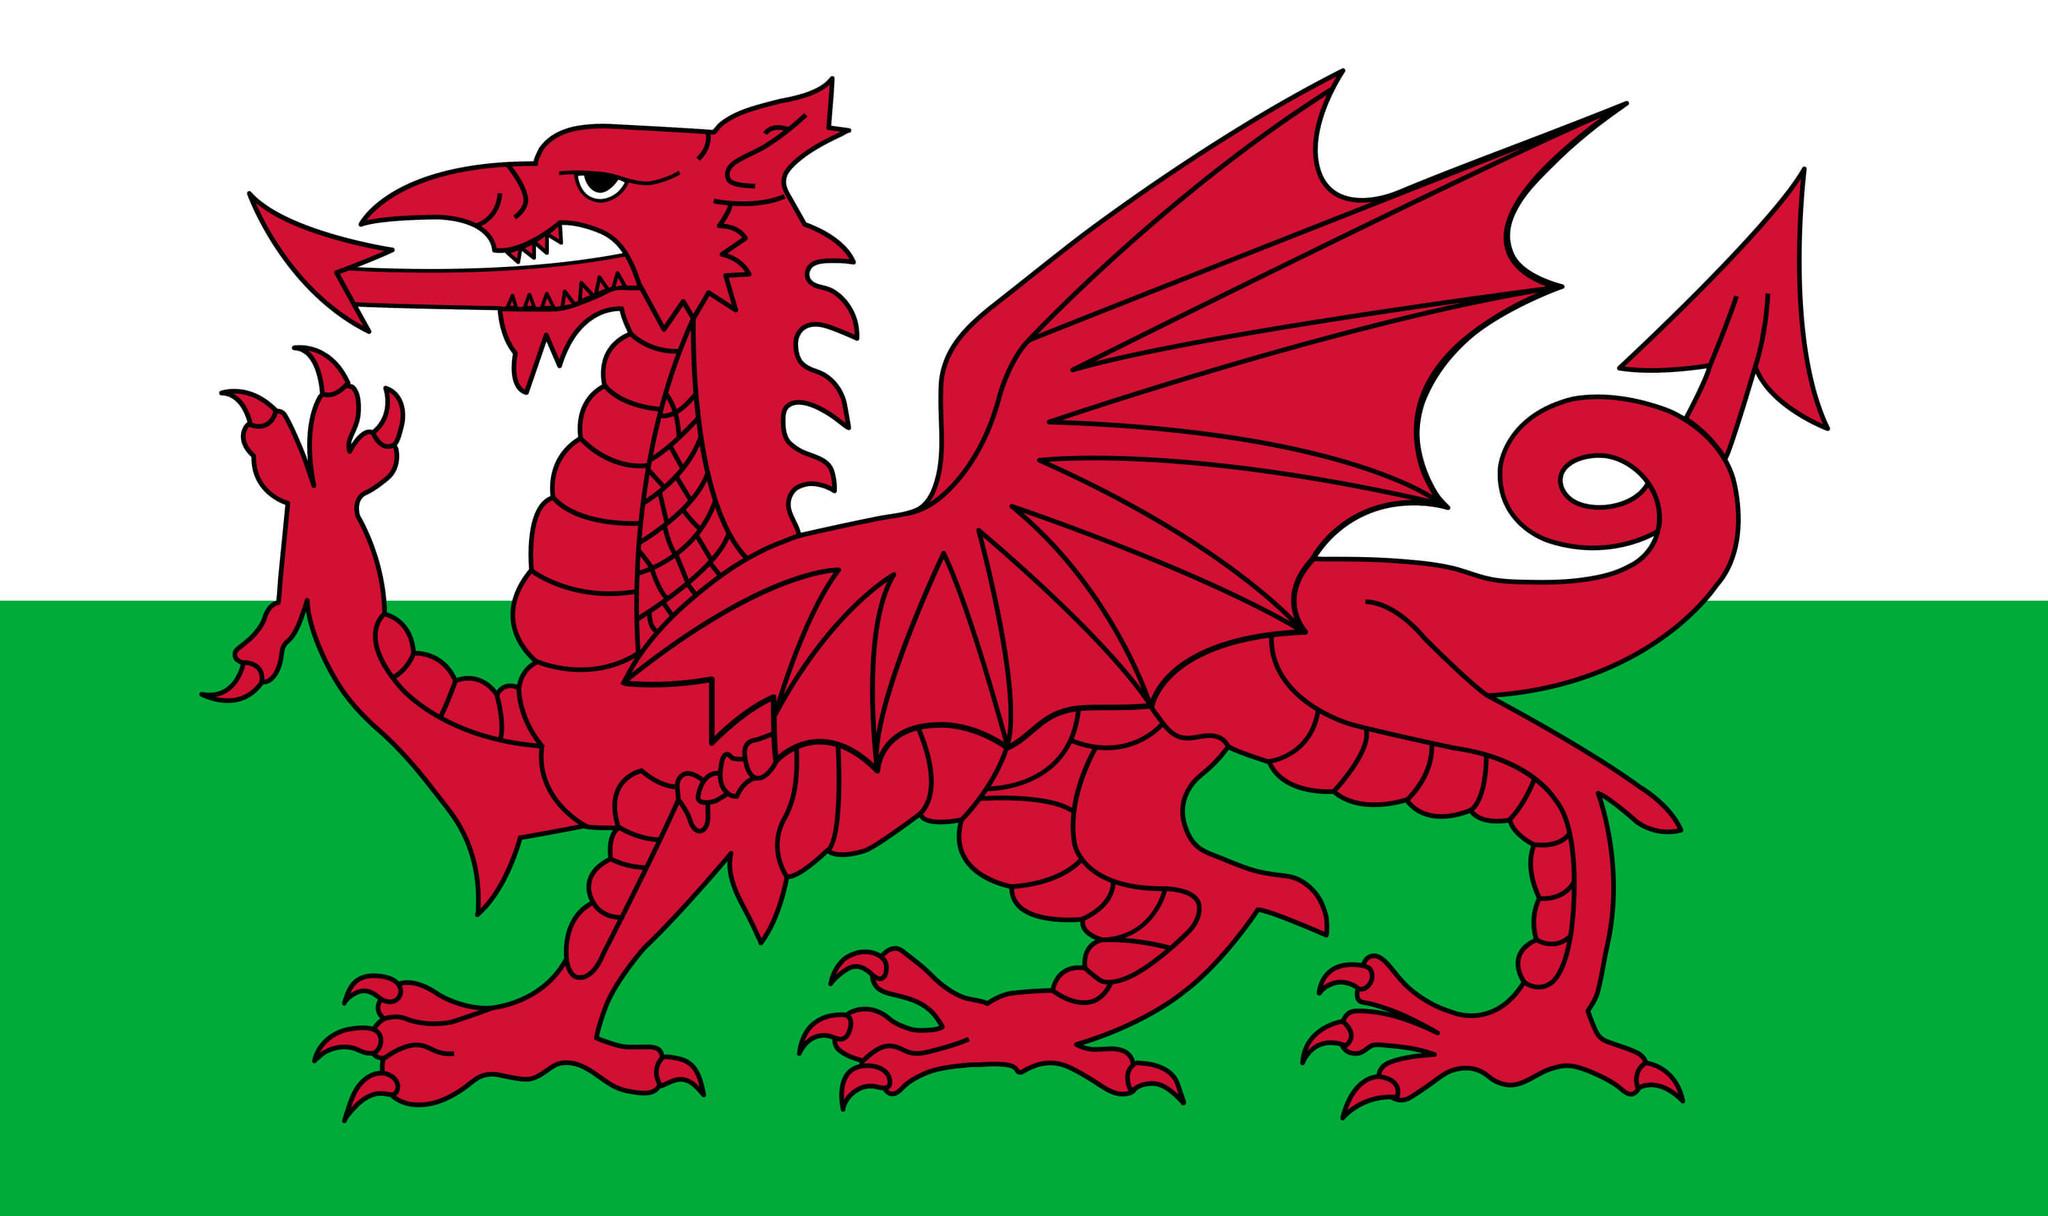 Wales Flagge Bedeutung